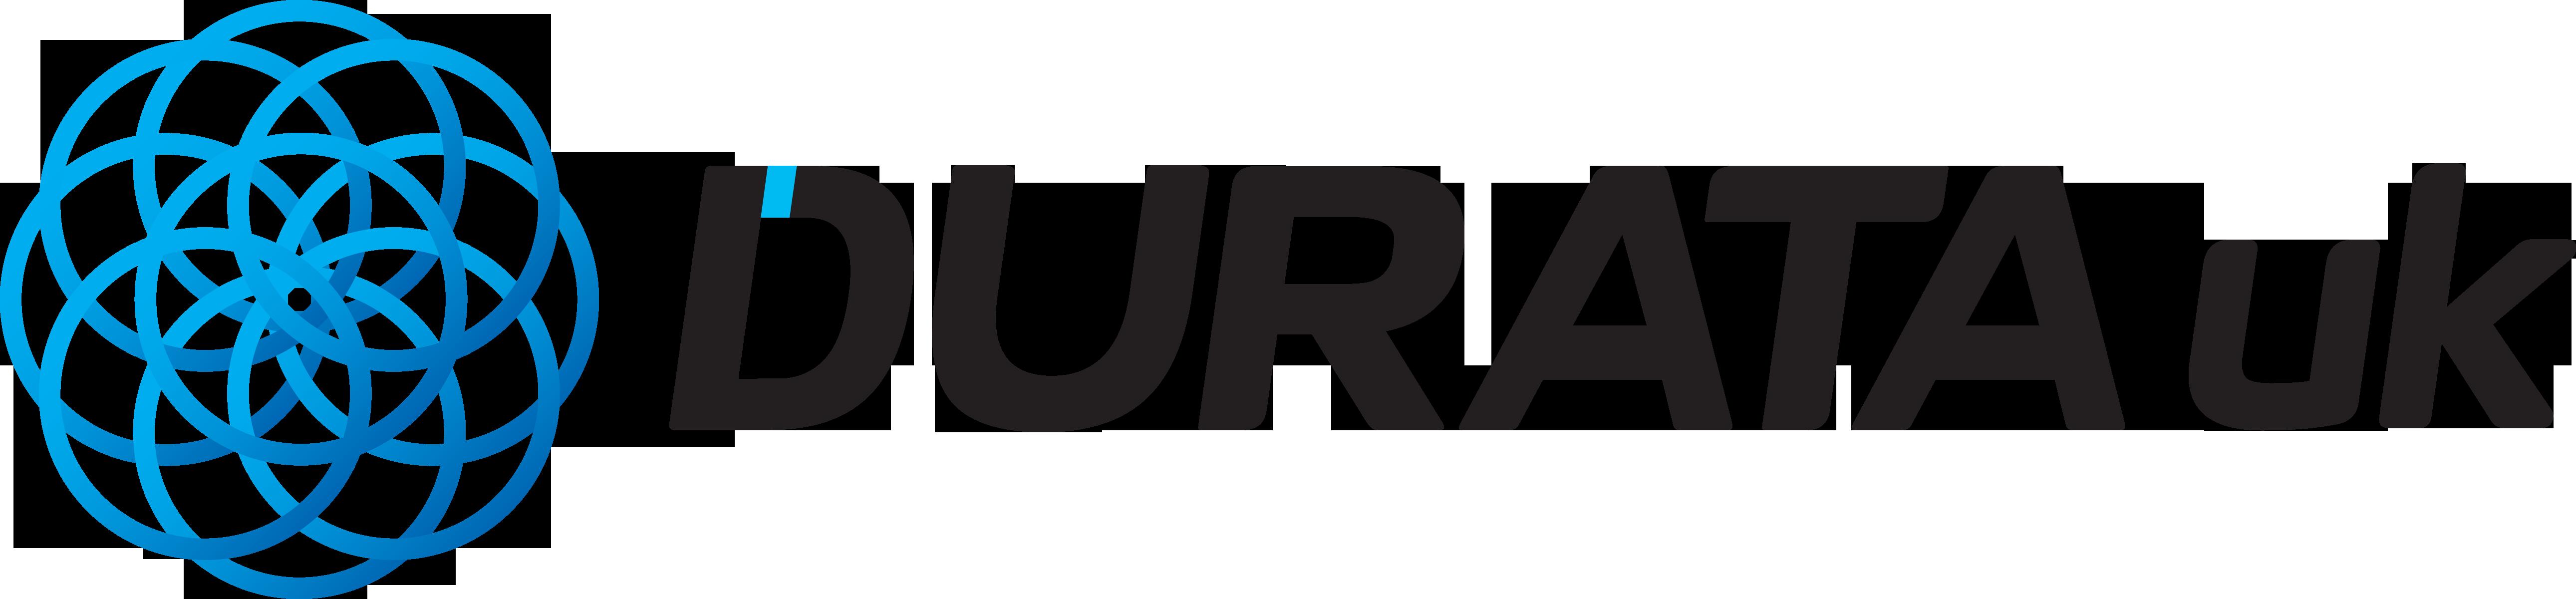 Durata Party Sponsor